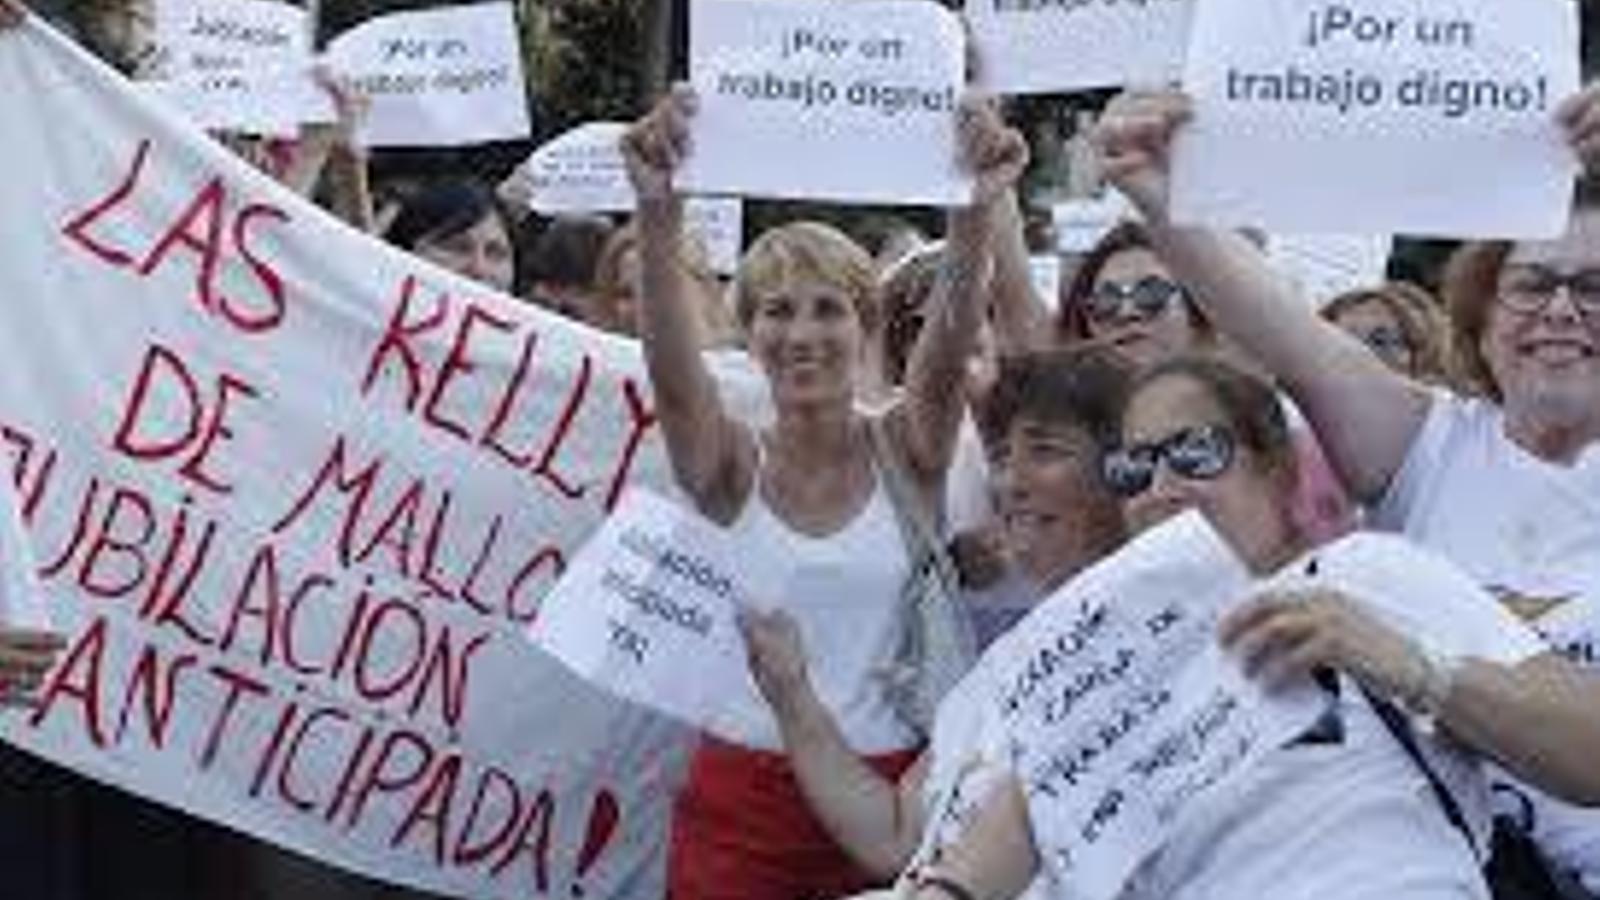 Les Kellys Unió Balears durant una protesta celebrada a Palma